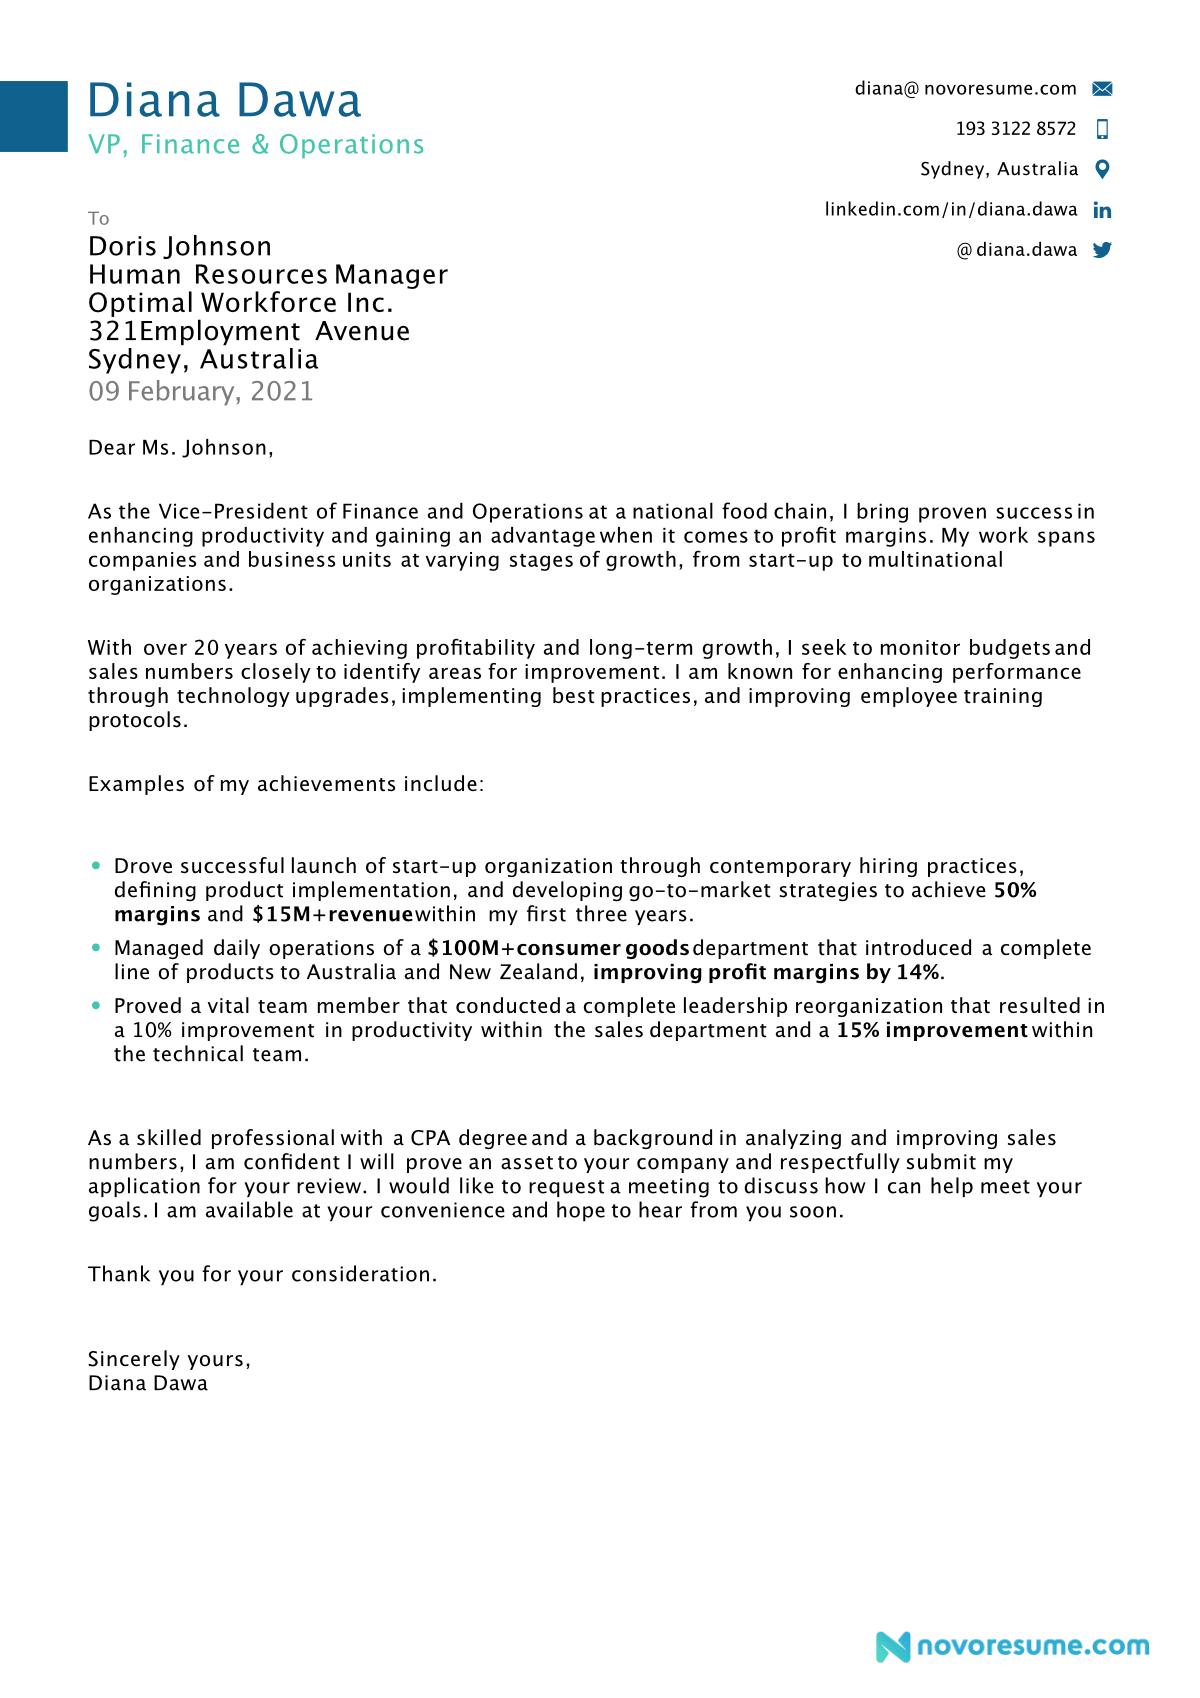 cover letter for job hunt